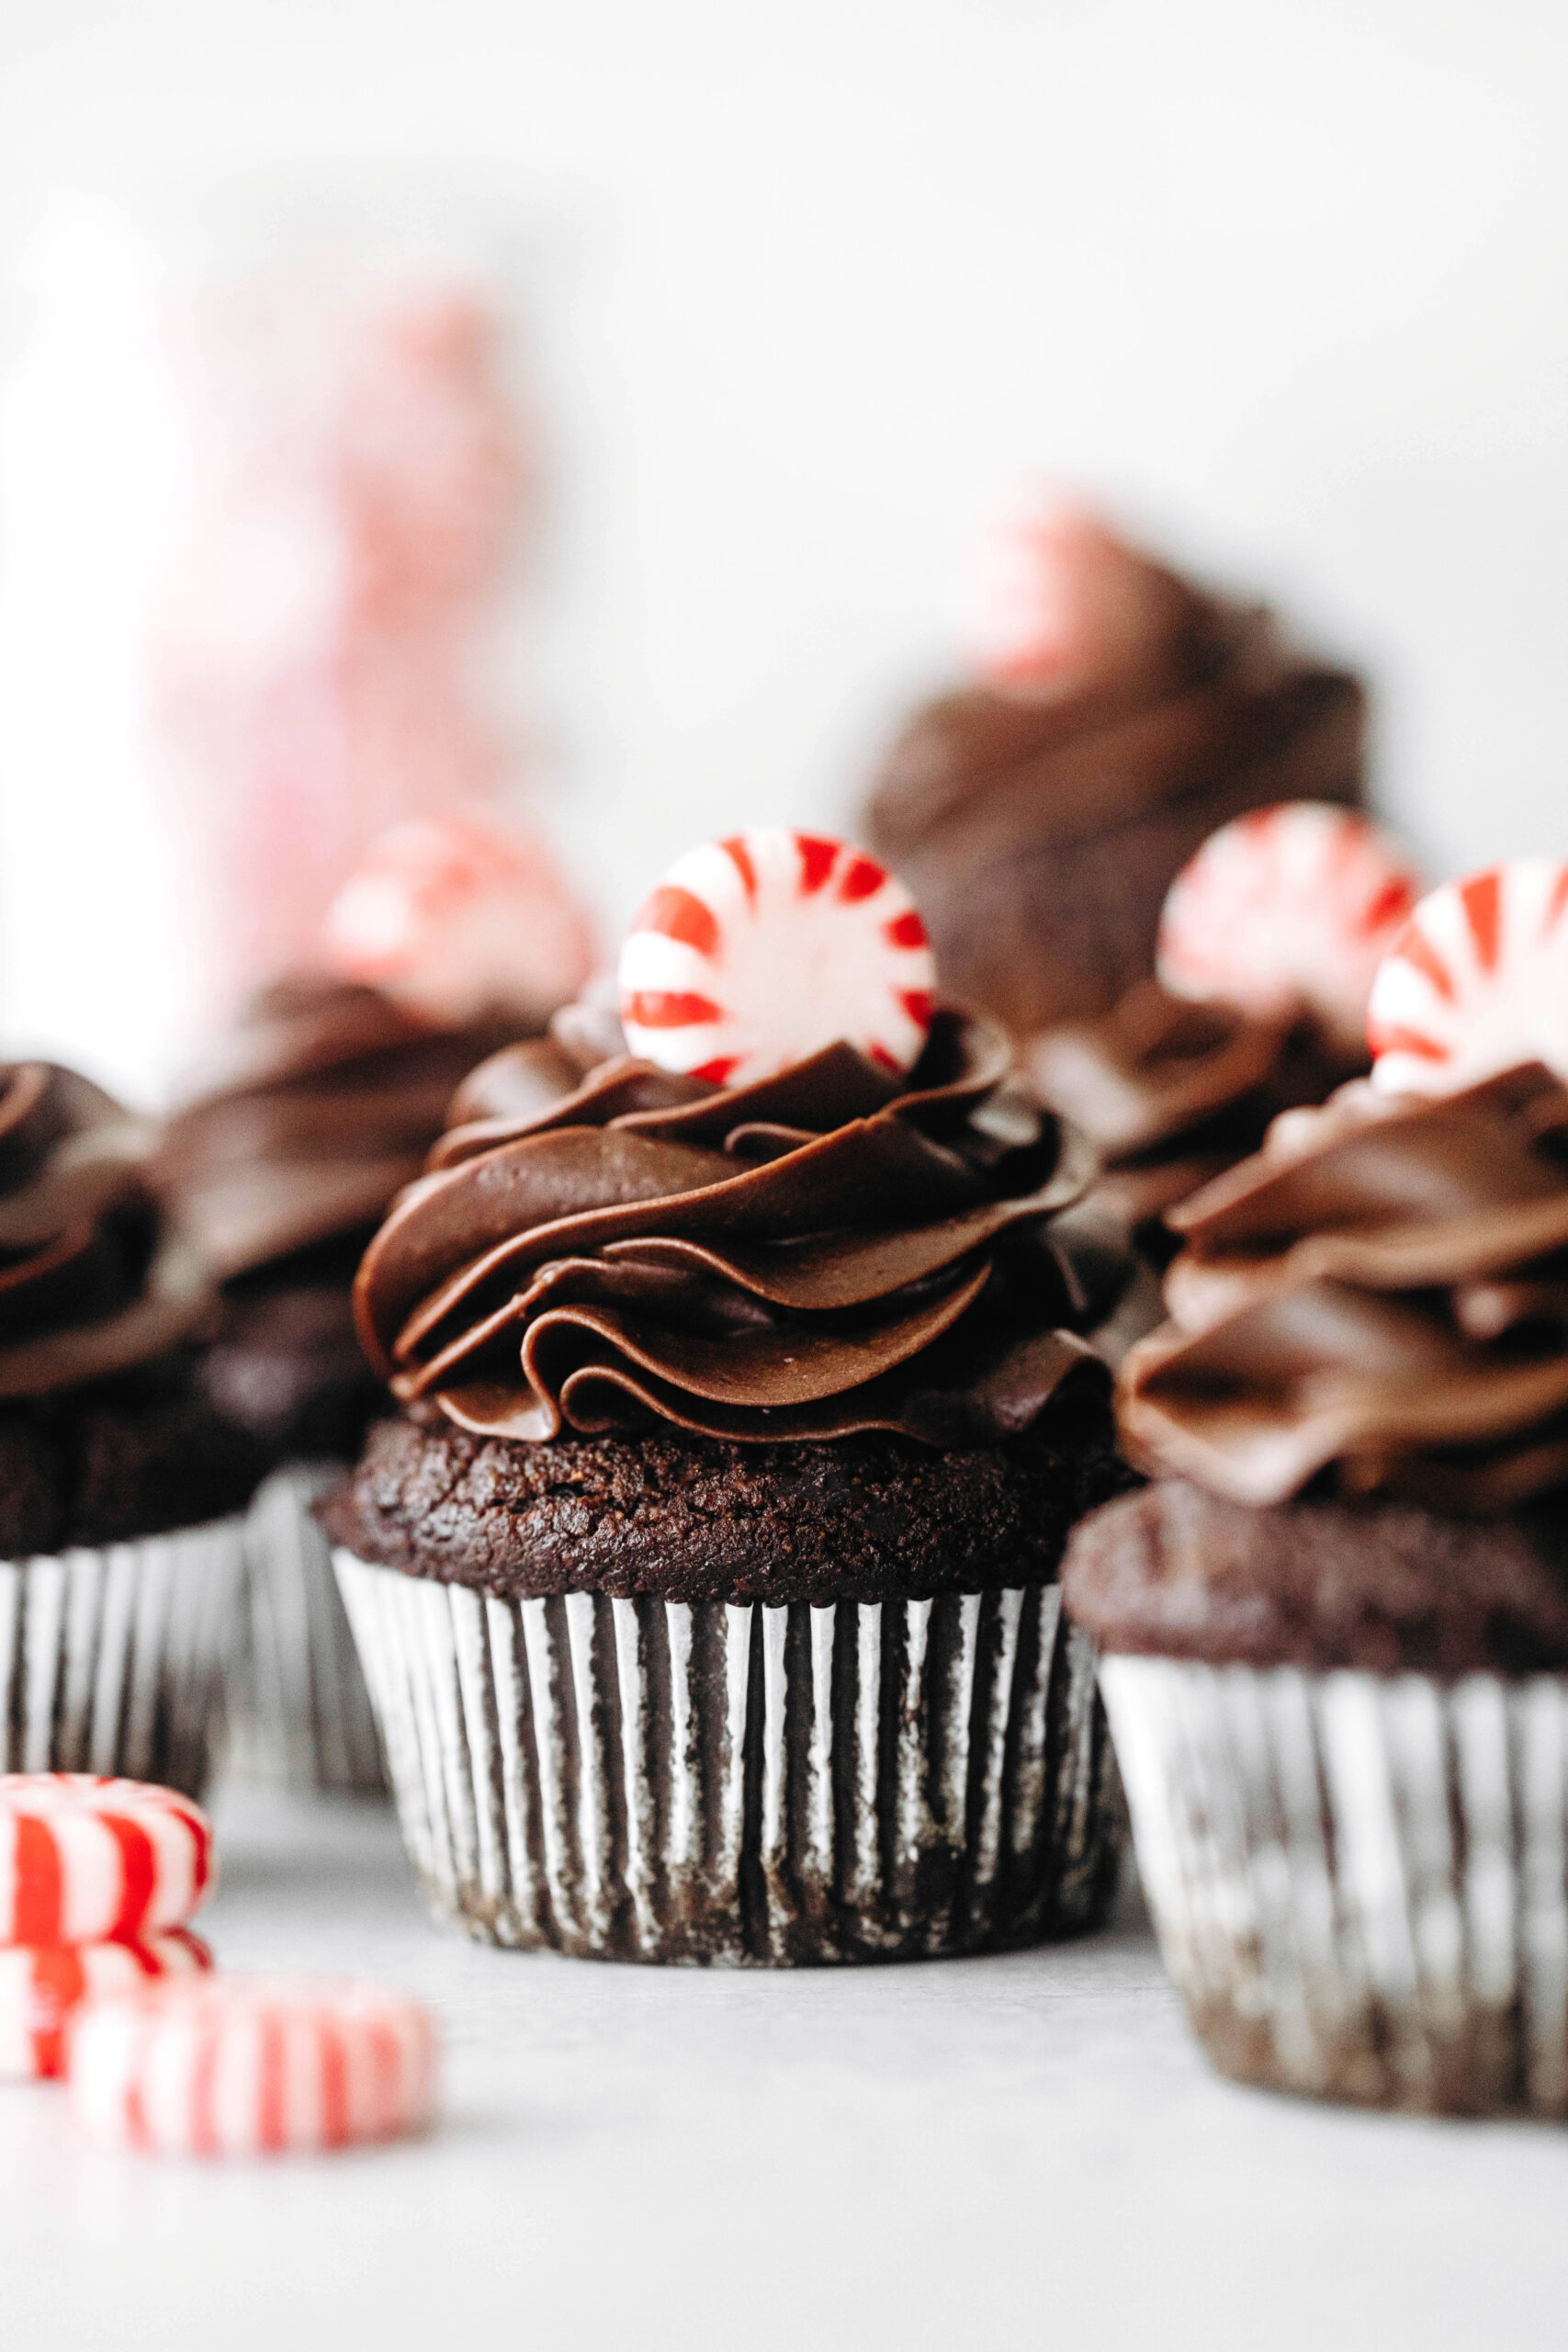 Peppermint Mocha Cupcakes (vegan + grain-free)